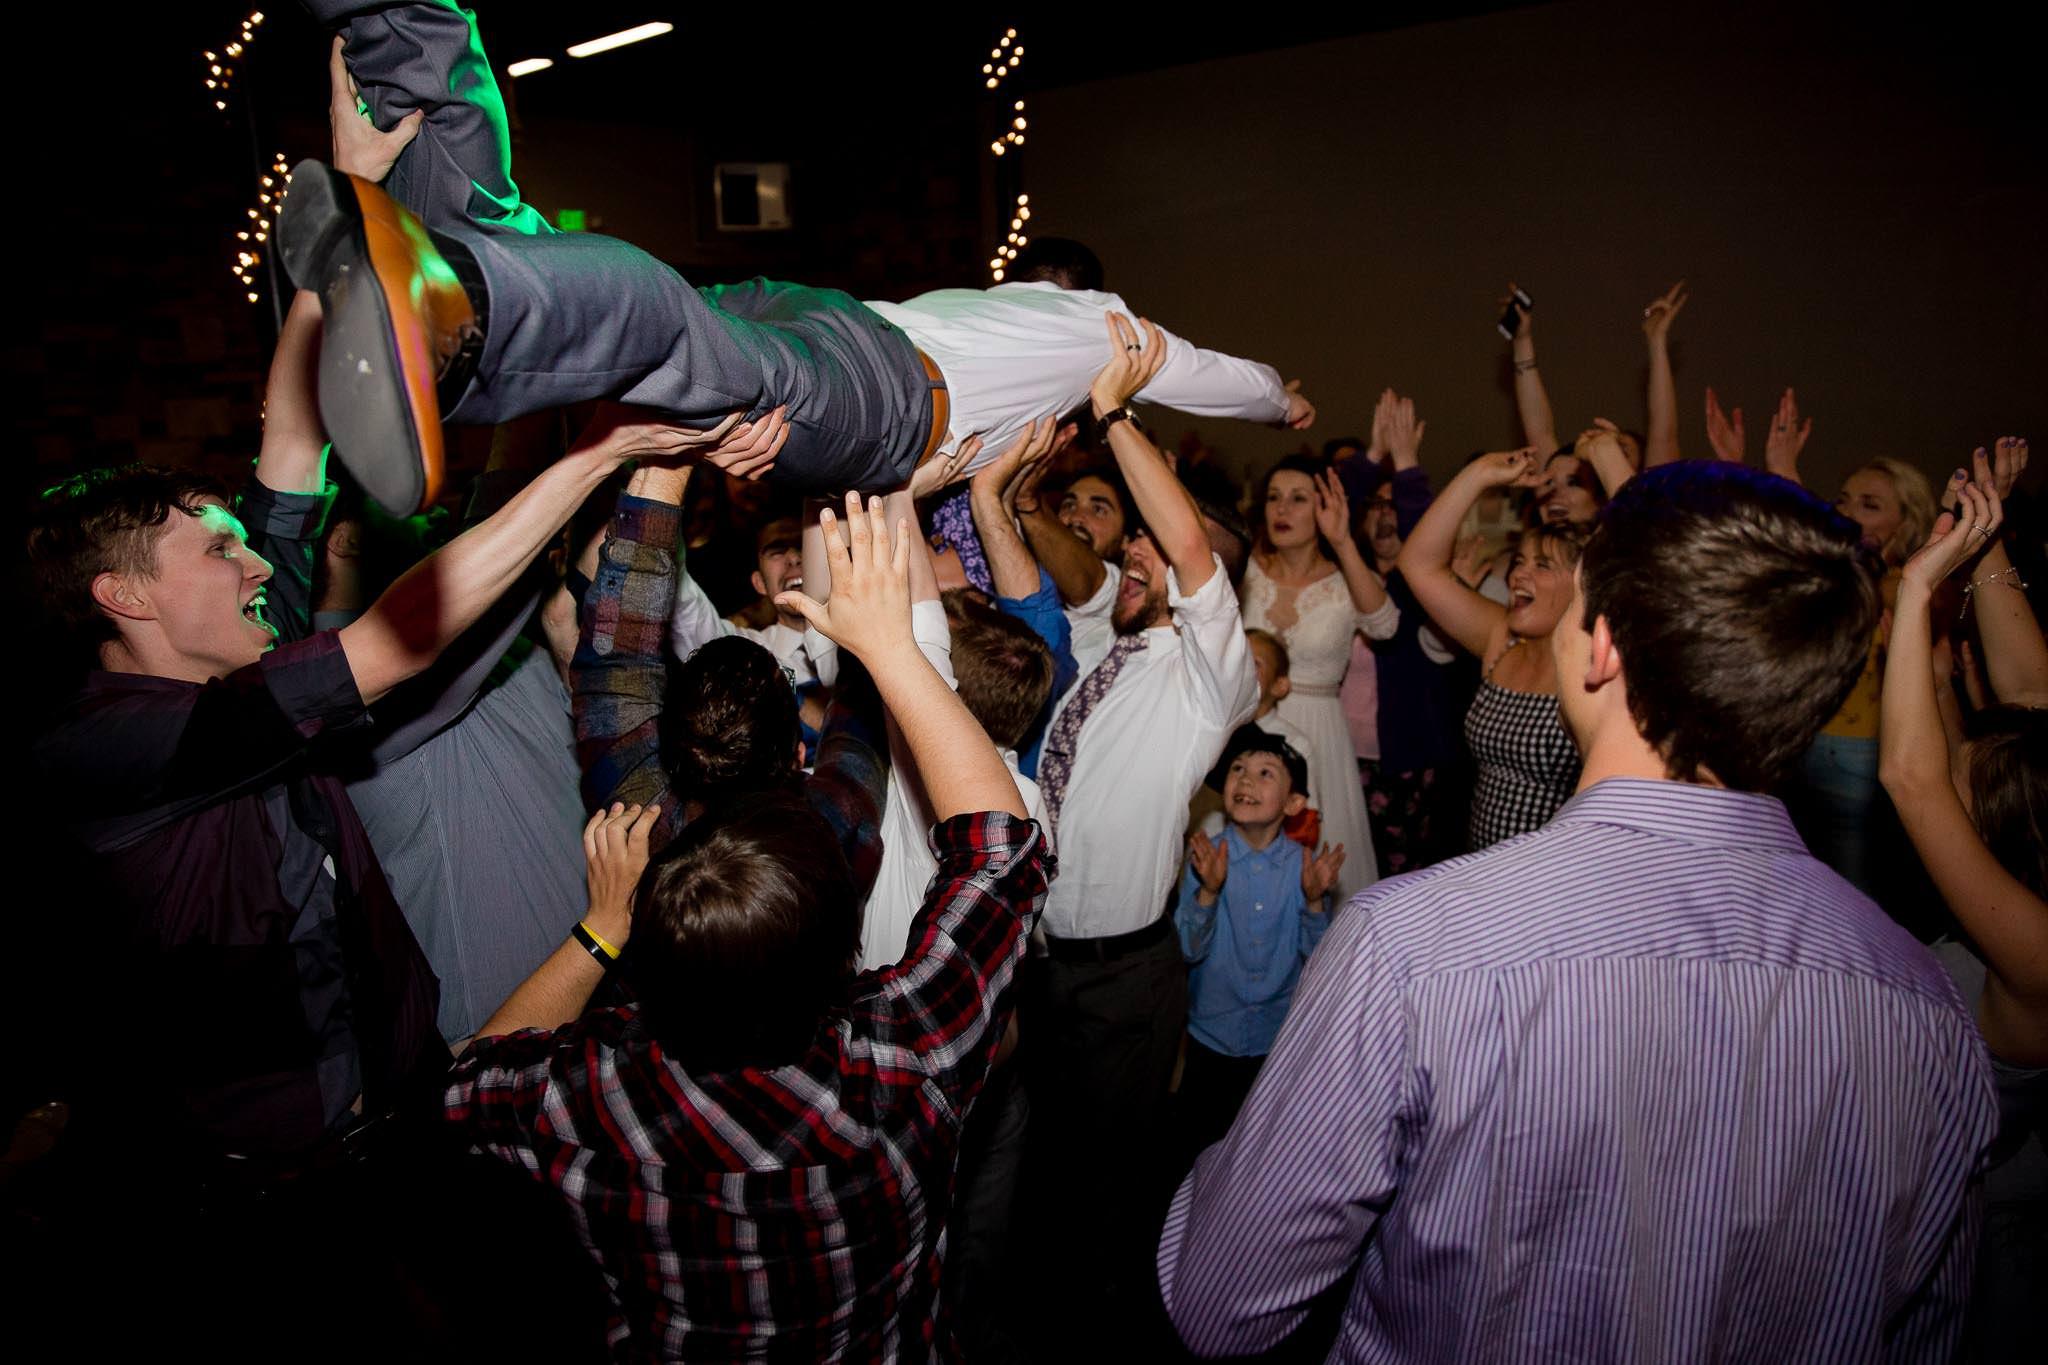 Groom crowdsurfing at wedding reception in Provo, Utah